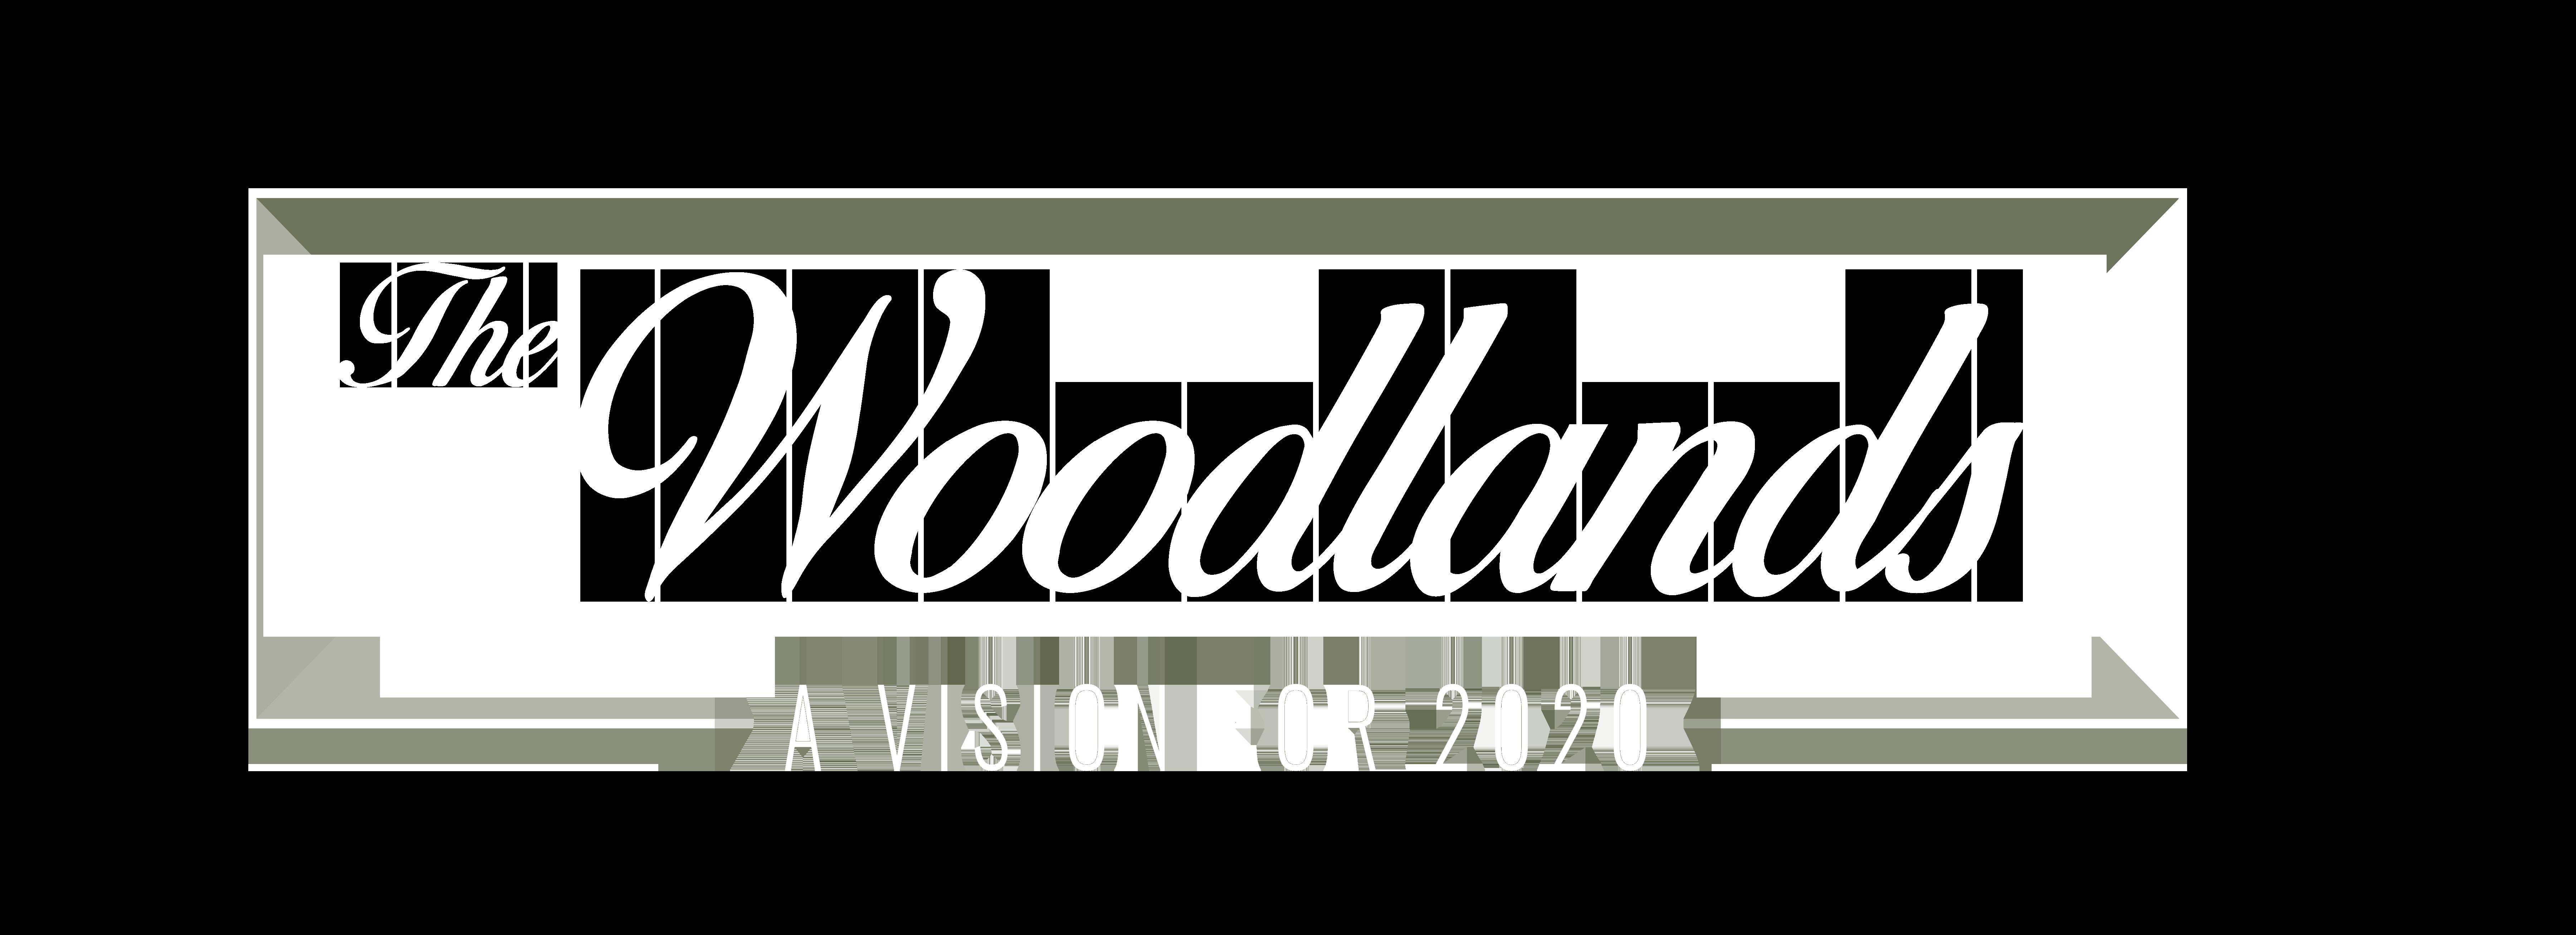 Woodlands 2020